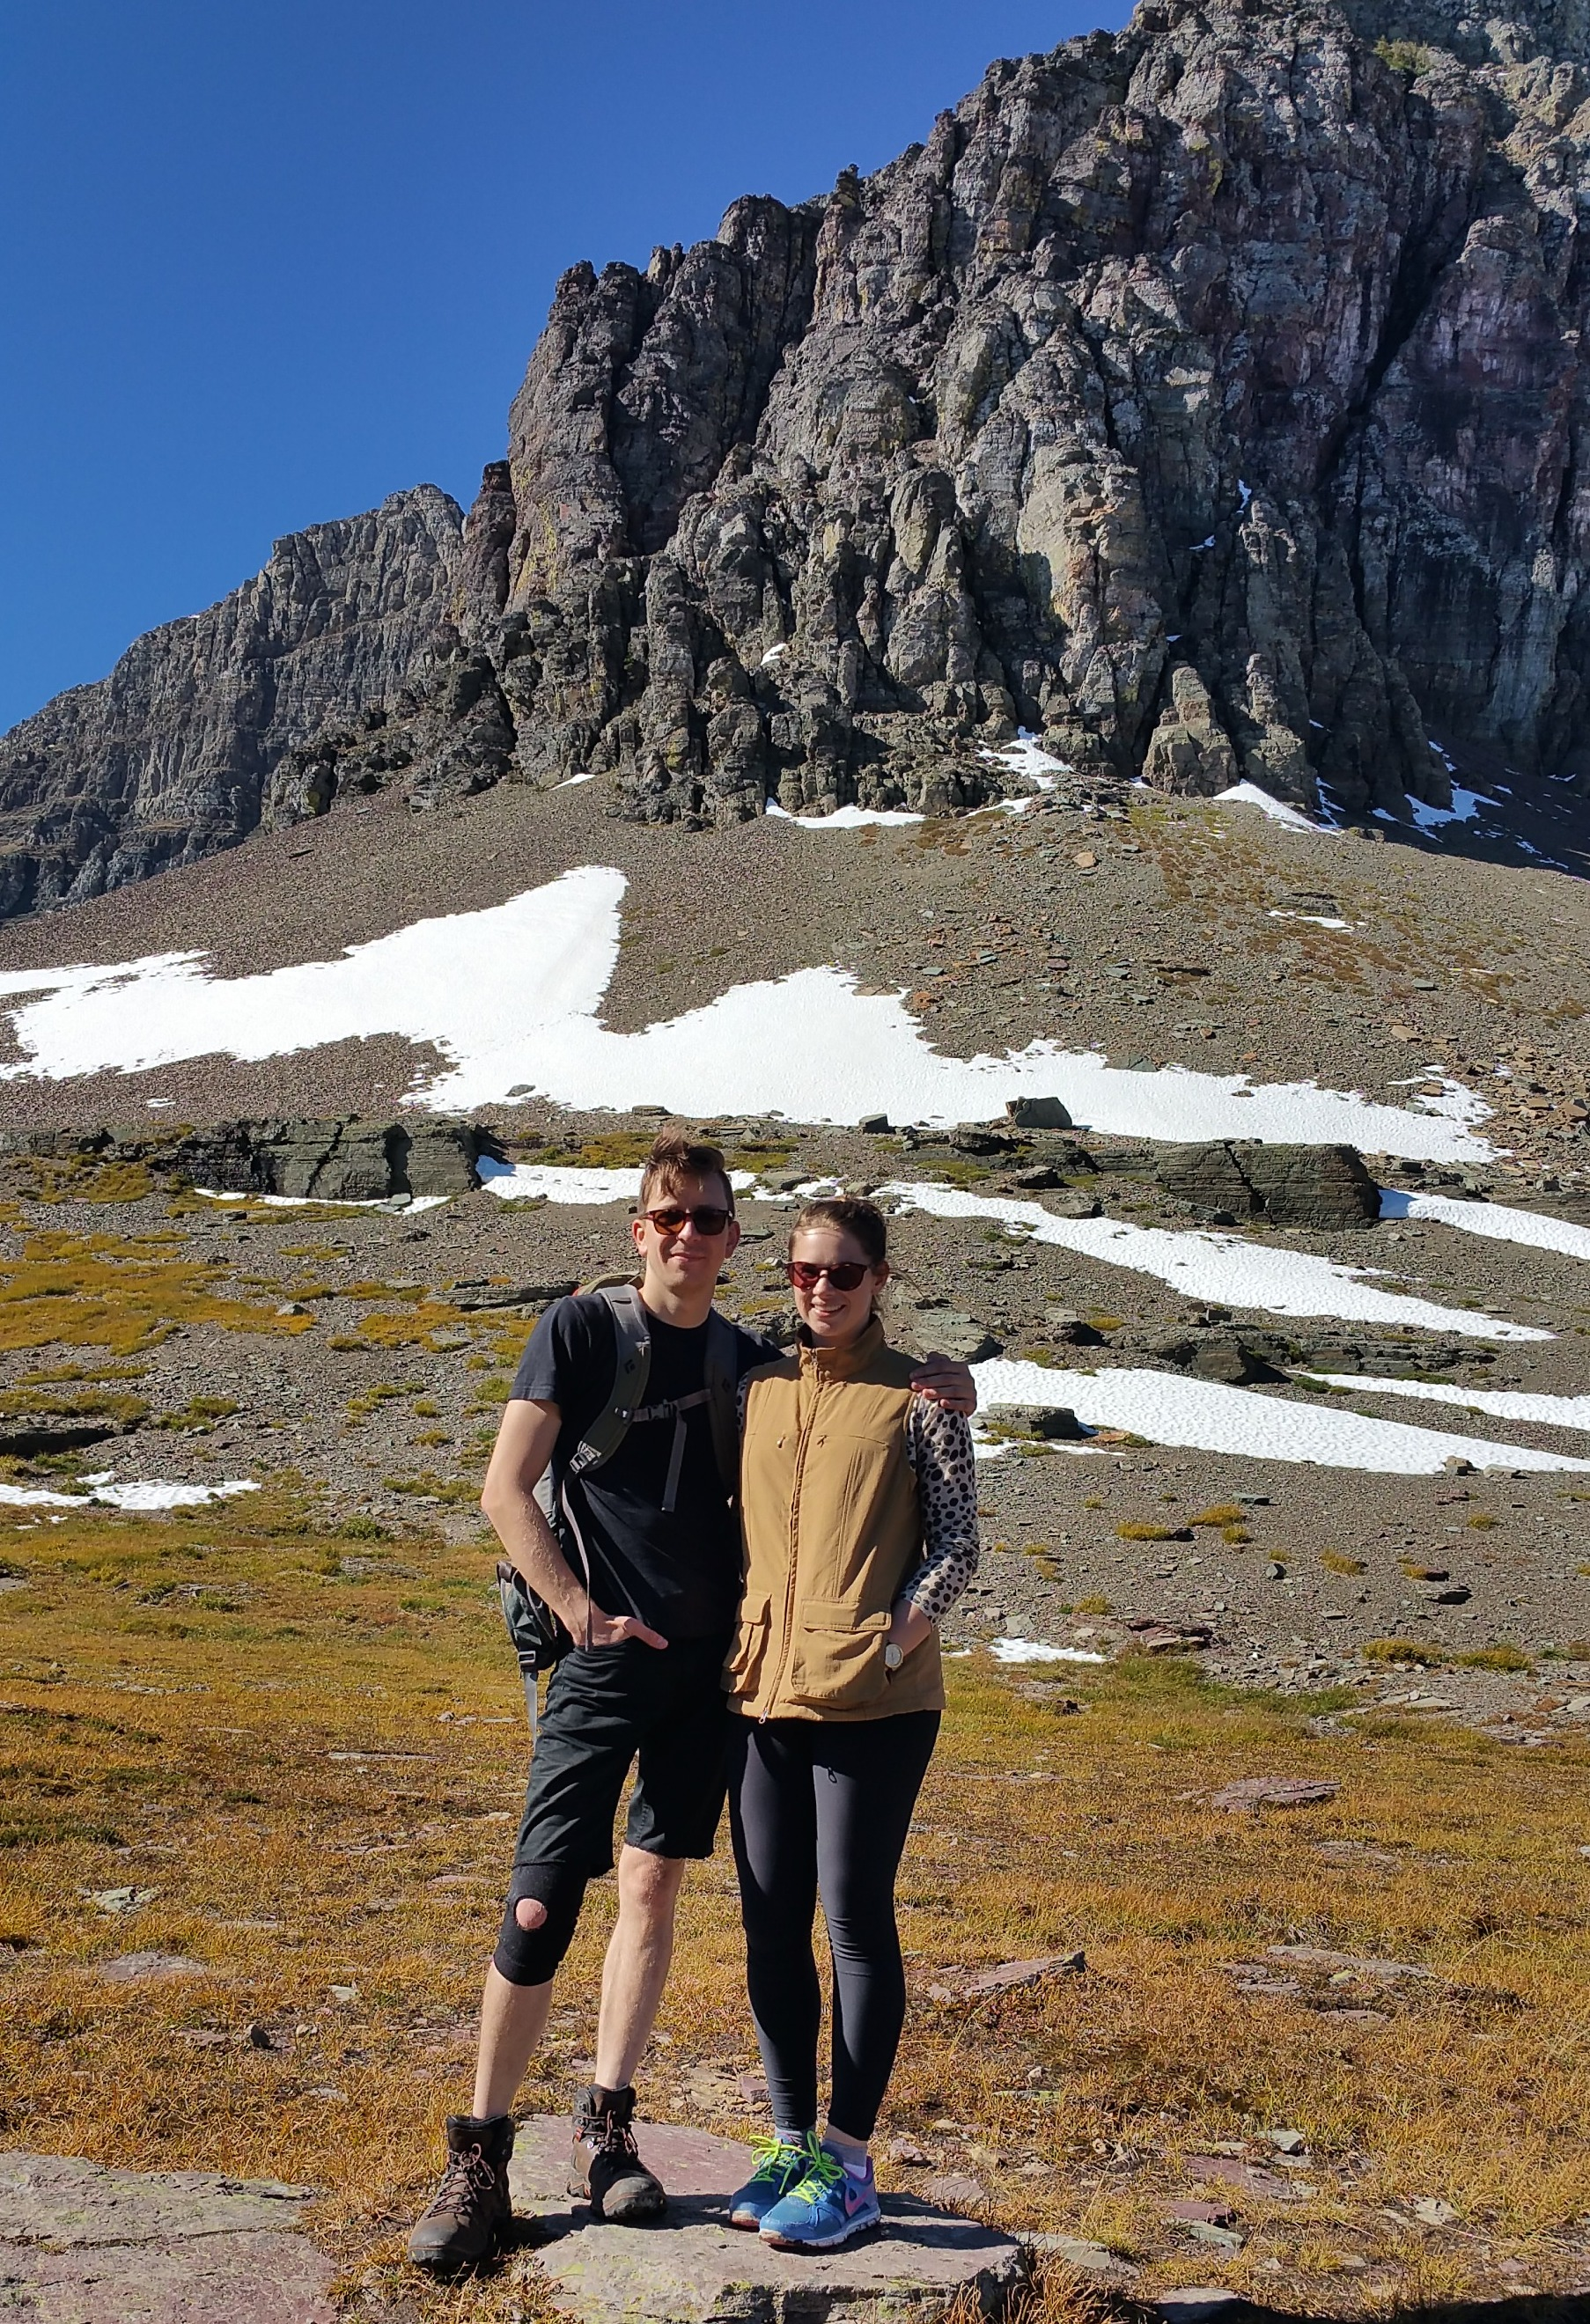 glacier-national-park-snow-hike